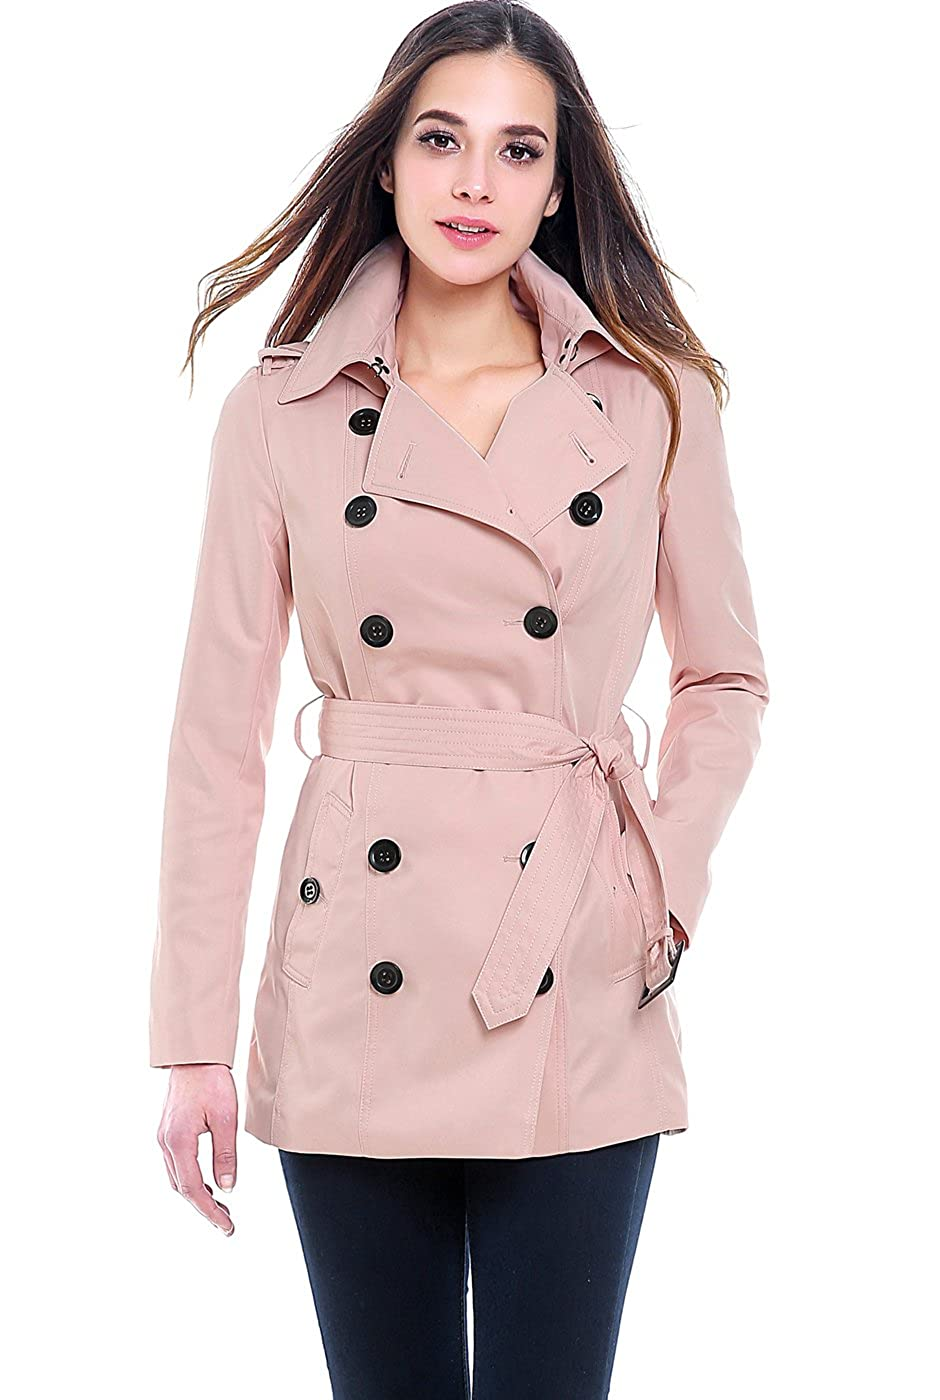 bluesh BGSD Women's Tori Classic Hooded Short Trench Coat